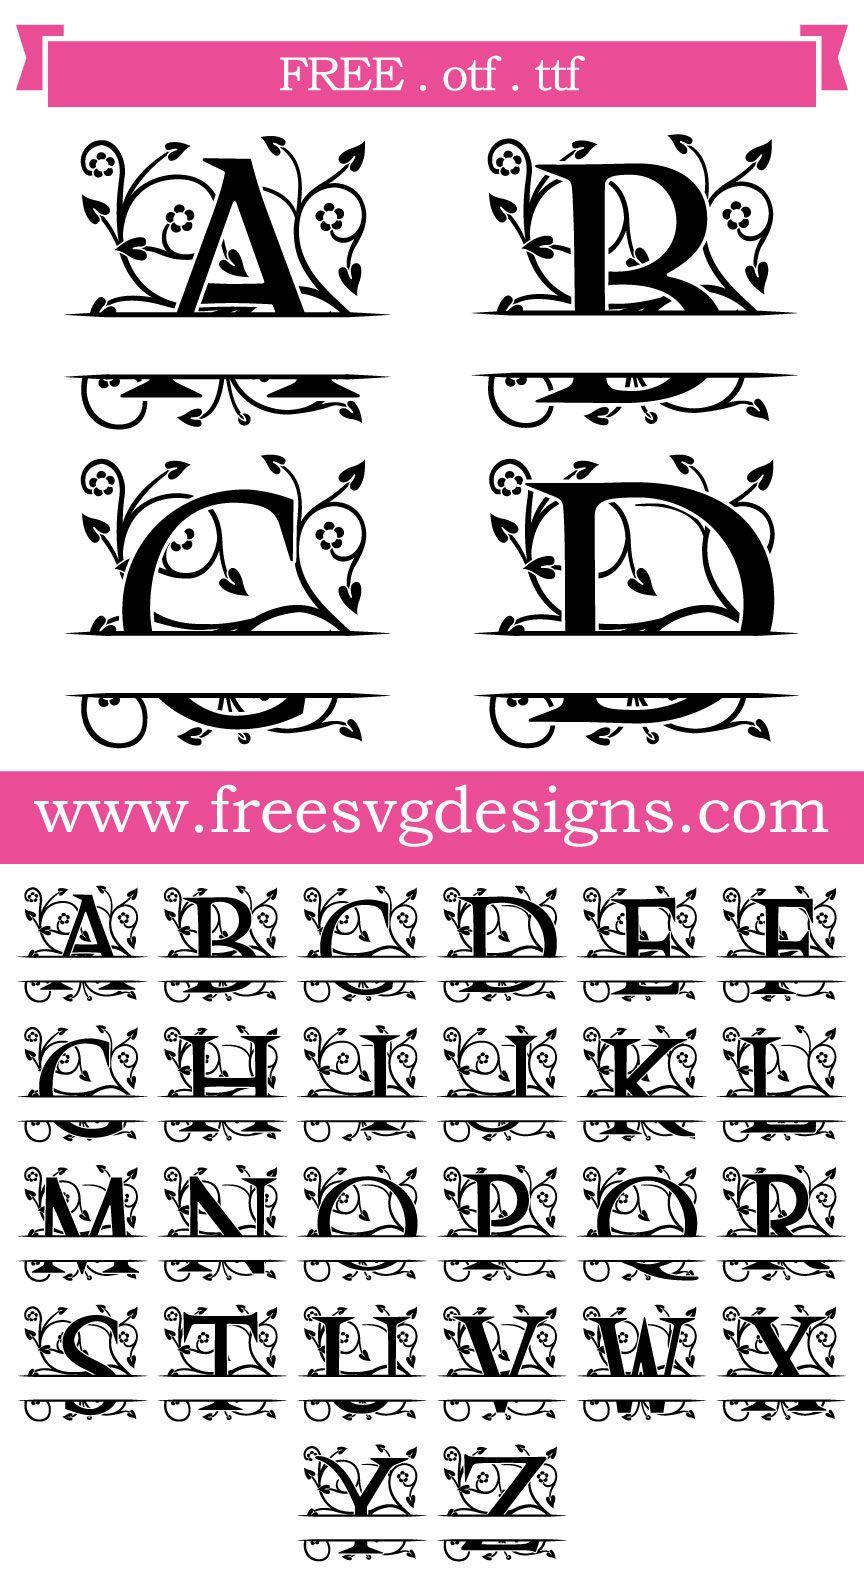 K Monogram Svg Free : monogram, Files, Ornate, Floral, Split, Monogram, Cricut, Monogram,, Fonts,, Fonts